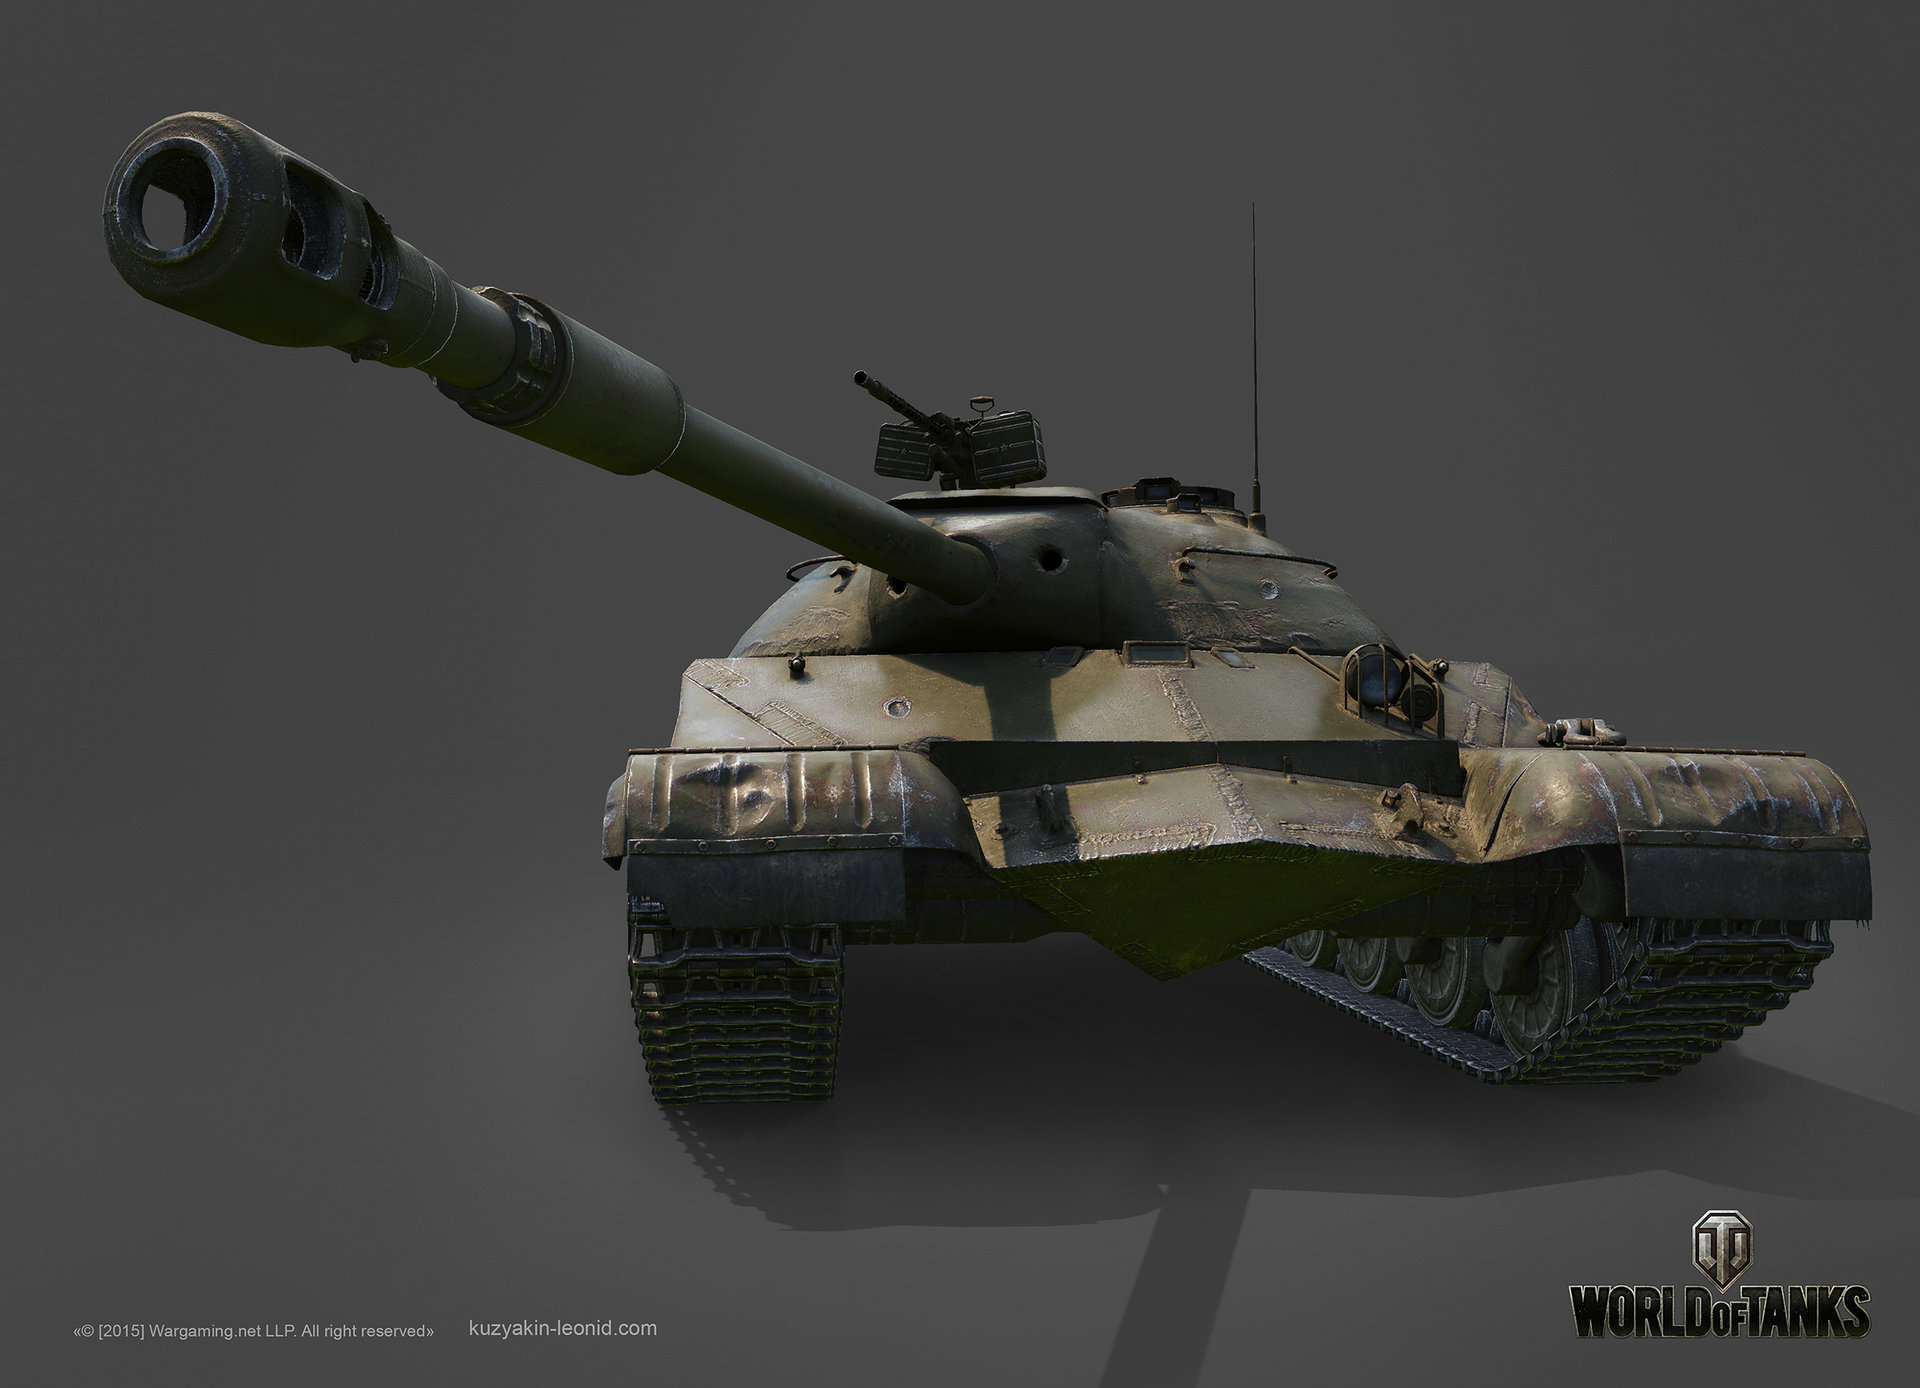 Leonid kuzyakin t 22s 04